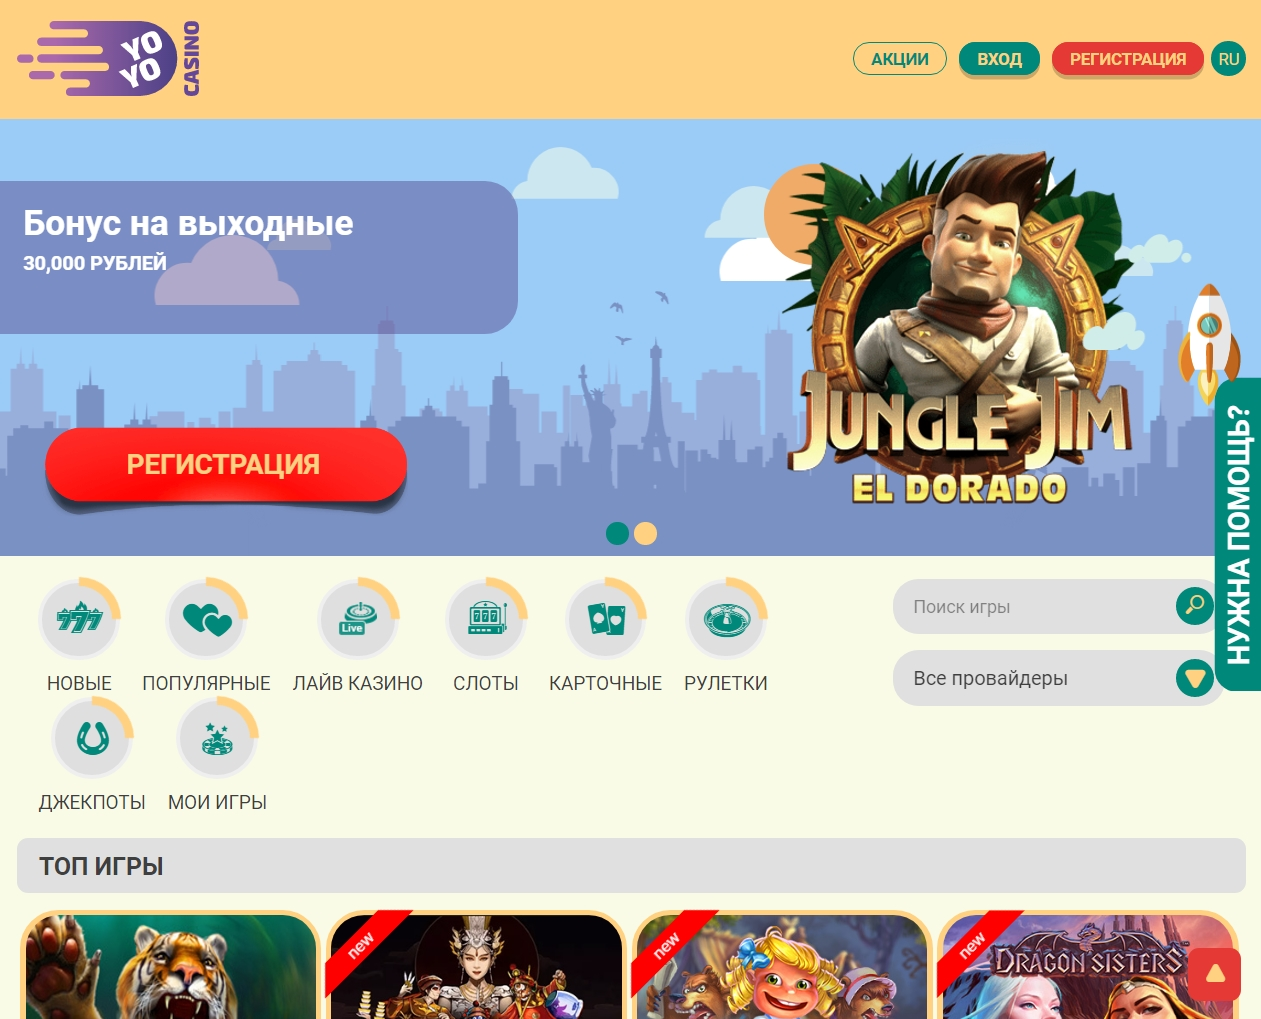 975% casino match bonus at Slots Capital